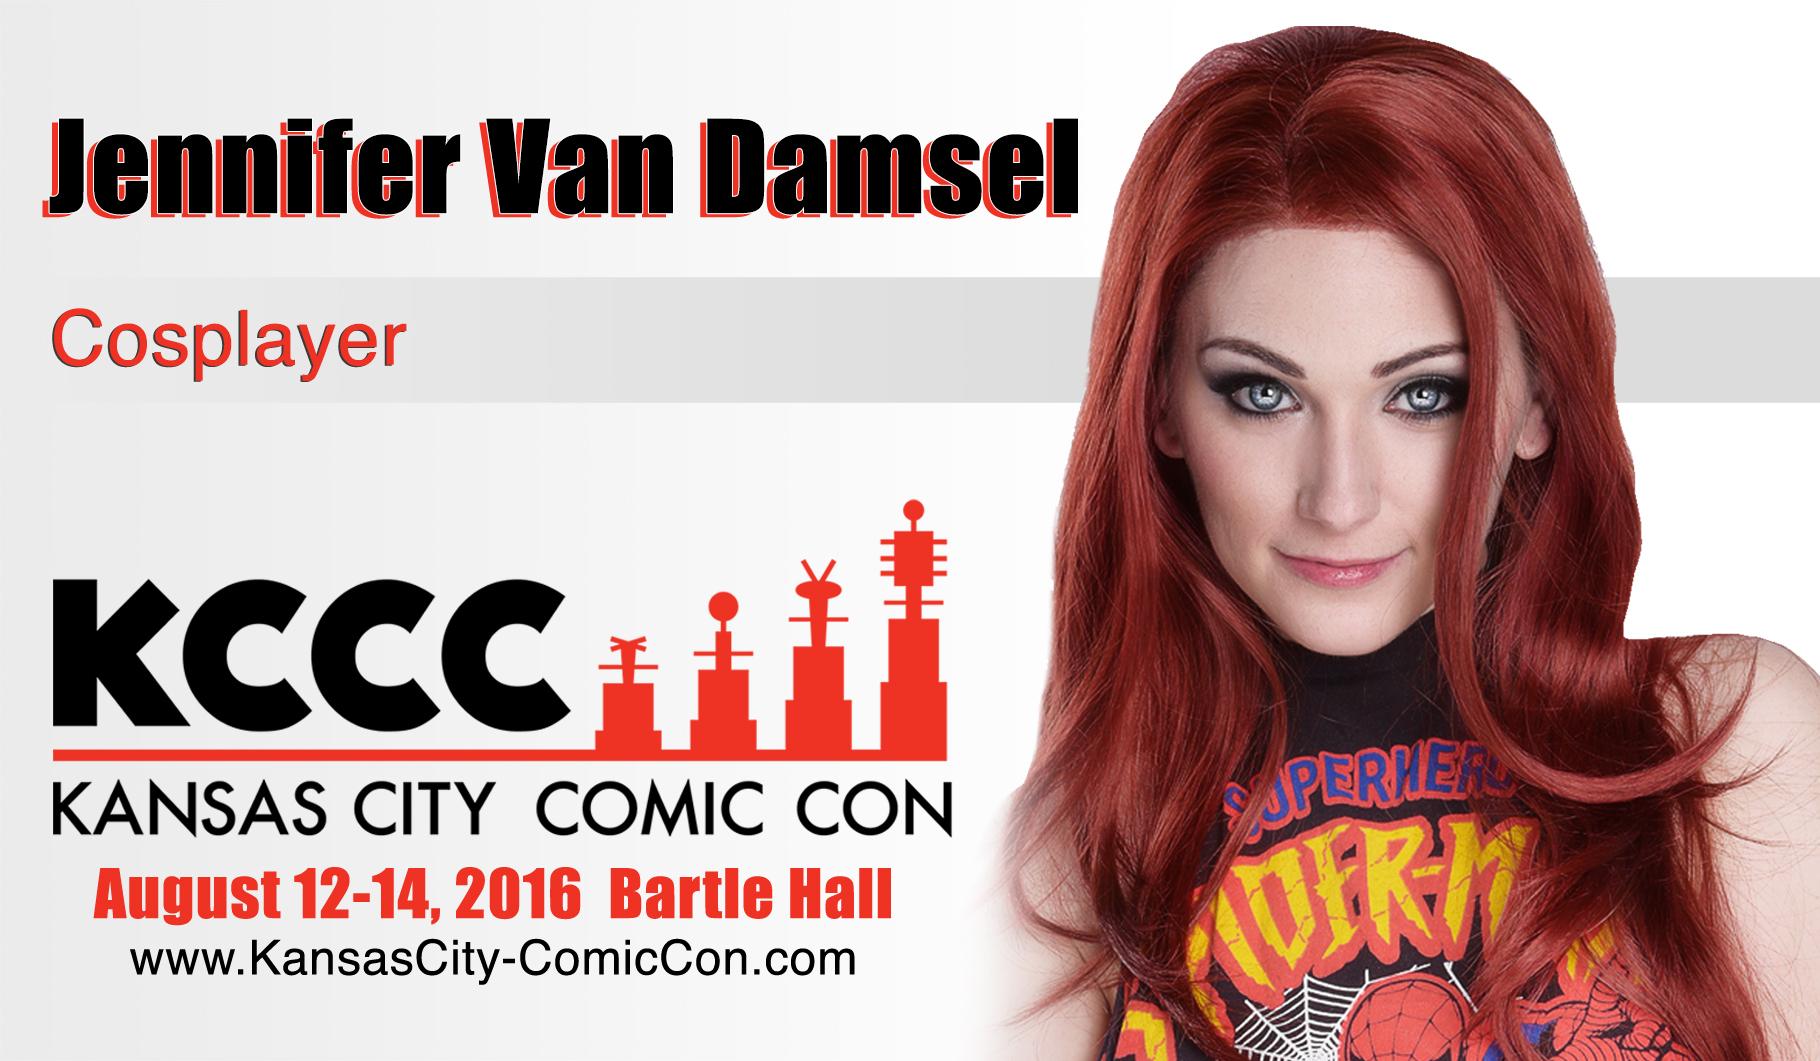 KCCC_Jennifer-Van-Damsel.jpg